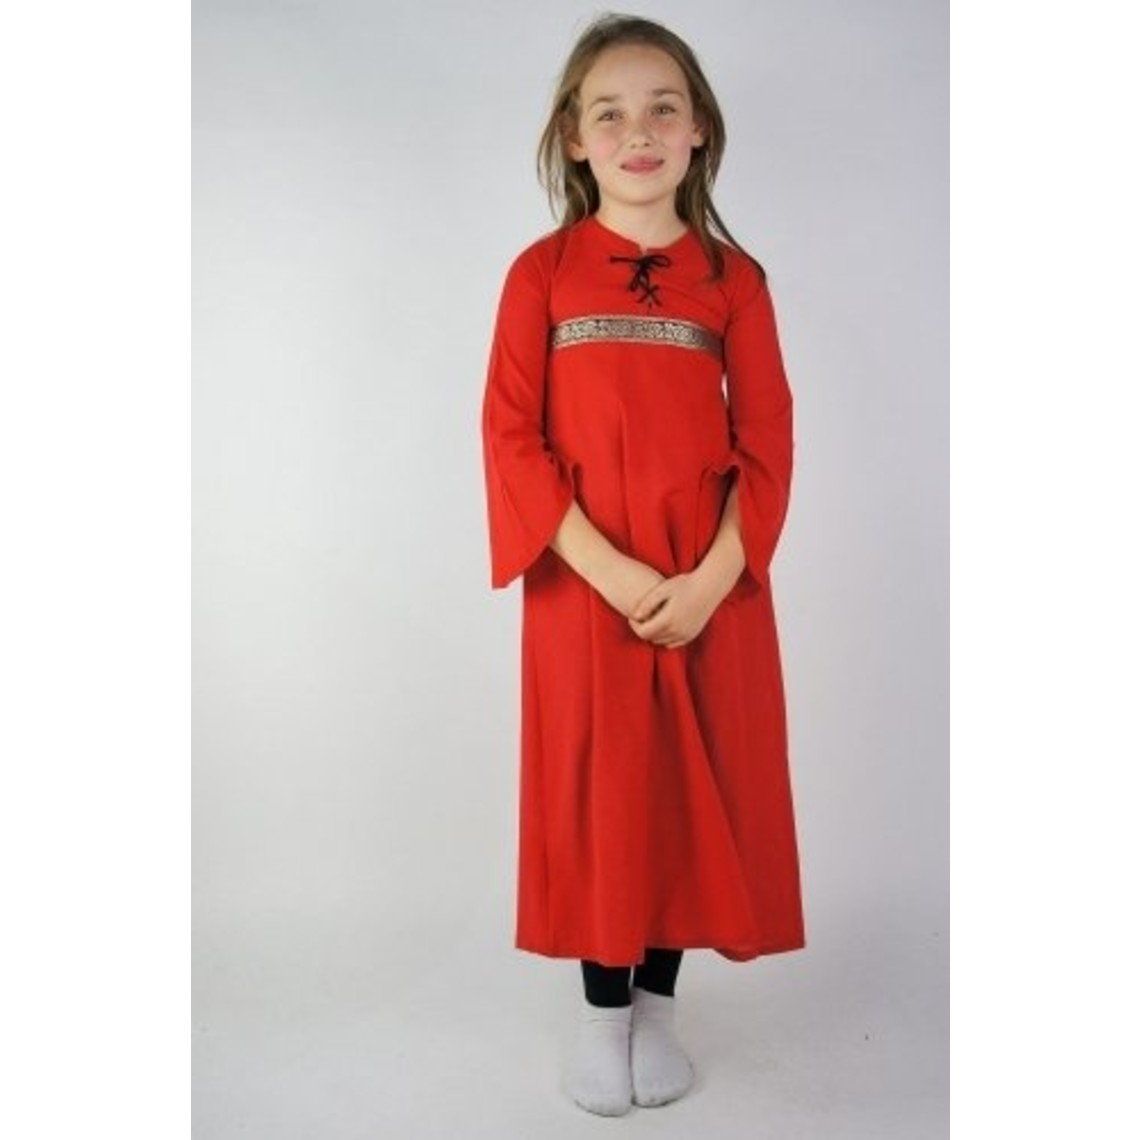 Leonardo Carbone Meisjesjurk Ariane, rood